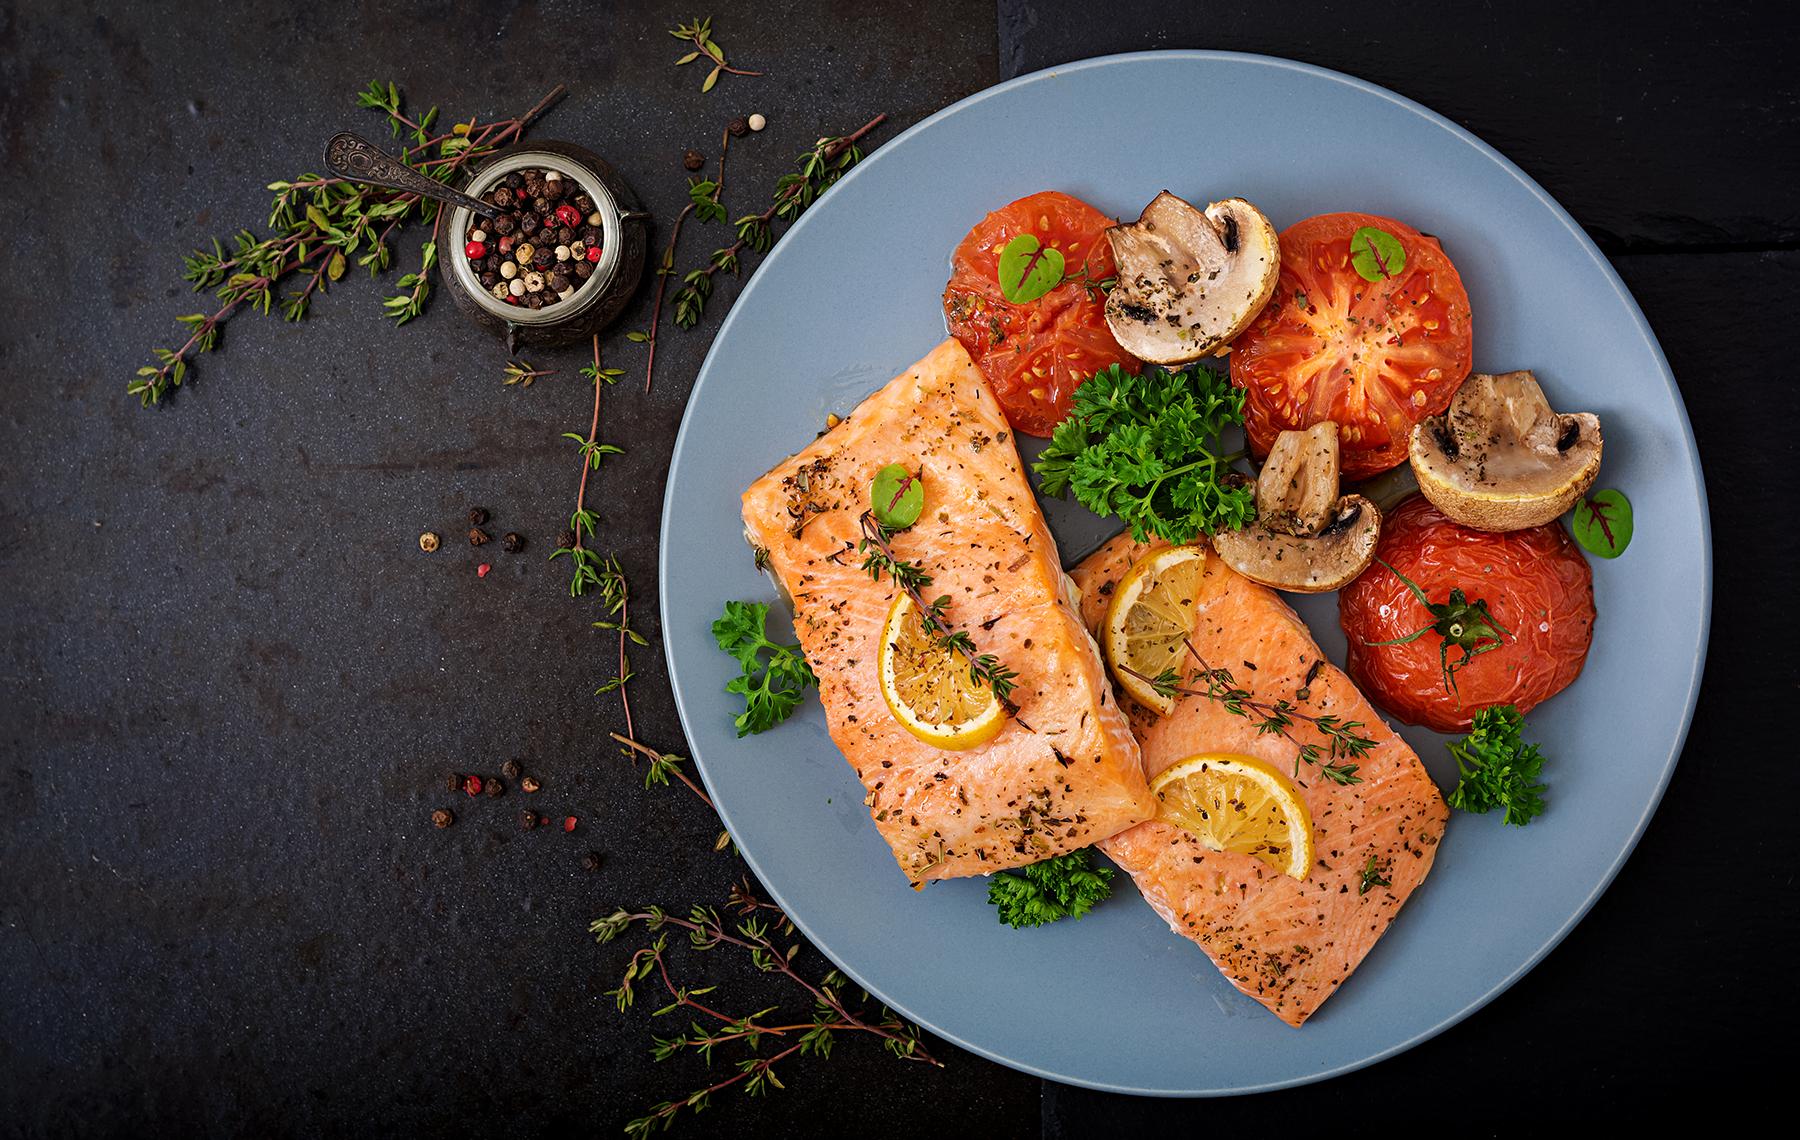 AltaMed fish dish